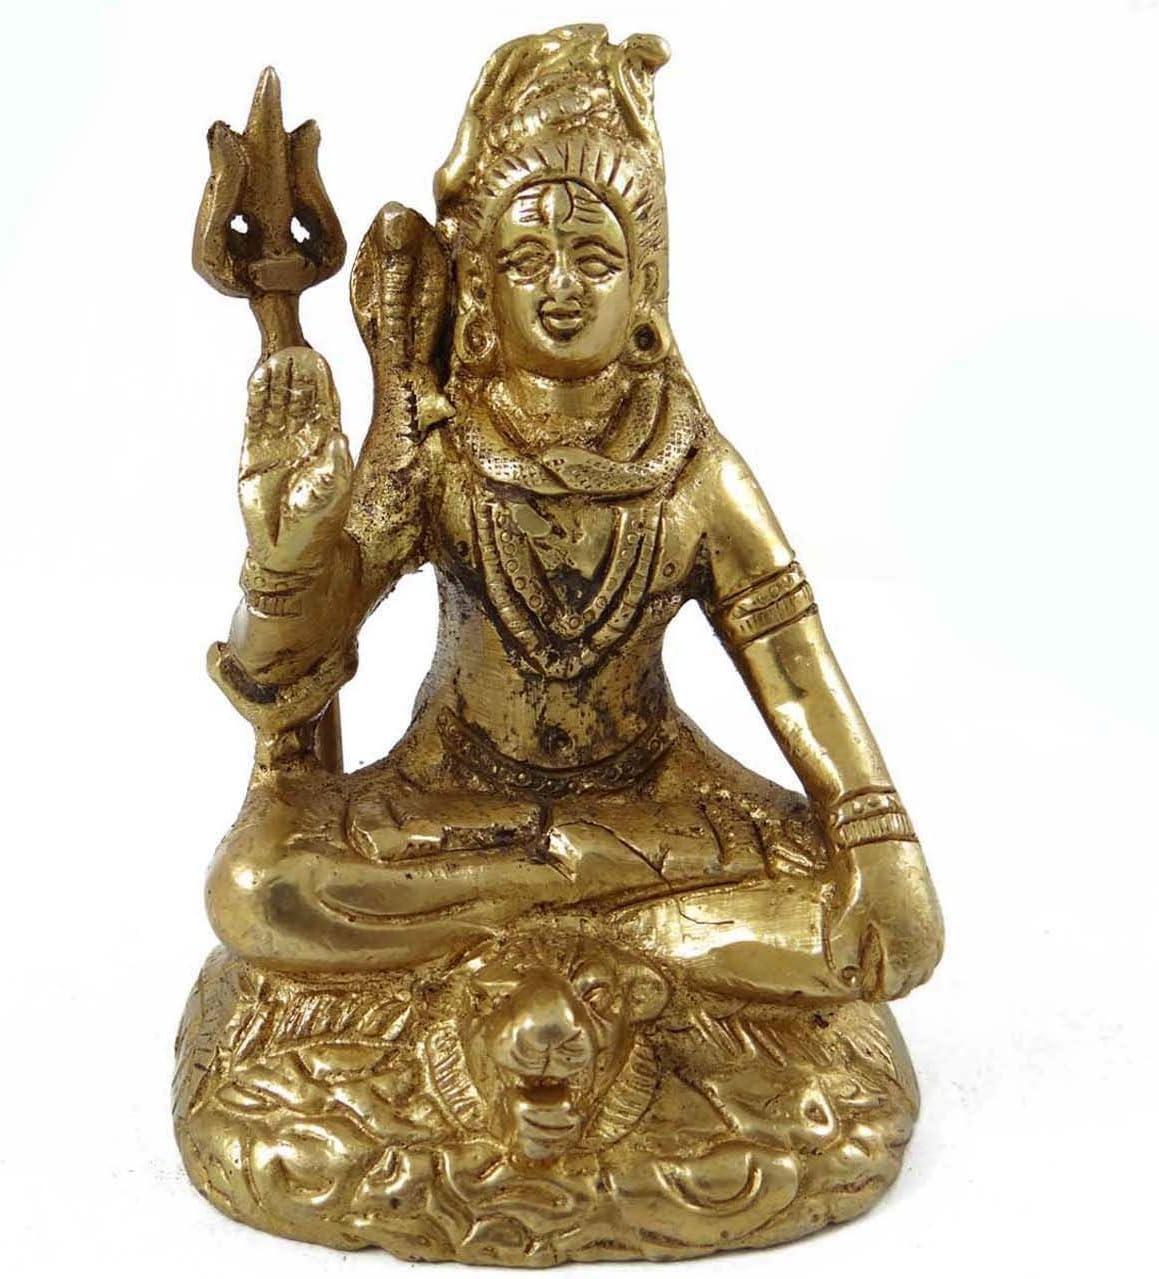 Lord Shiva ゴールドen壁装飾真鍮メタルFigurine従来の装飾アート